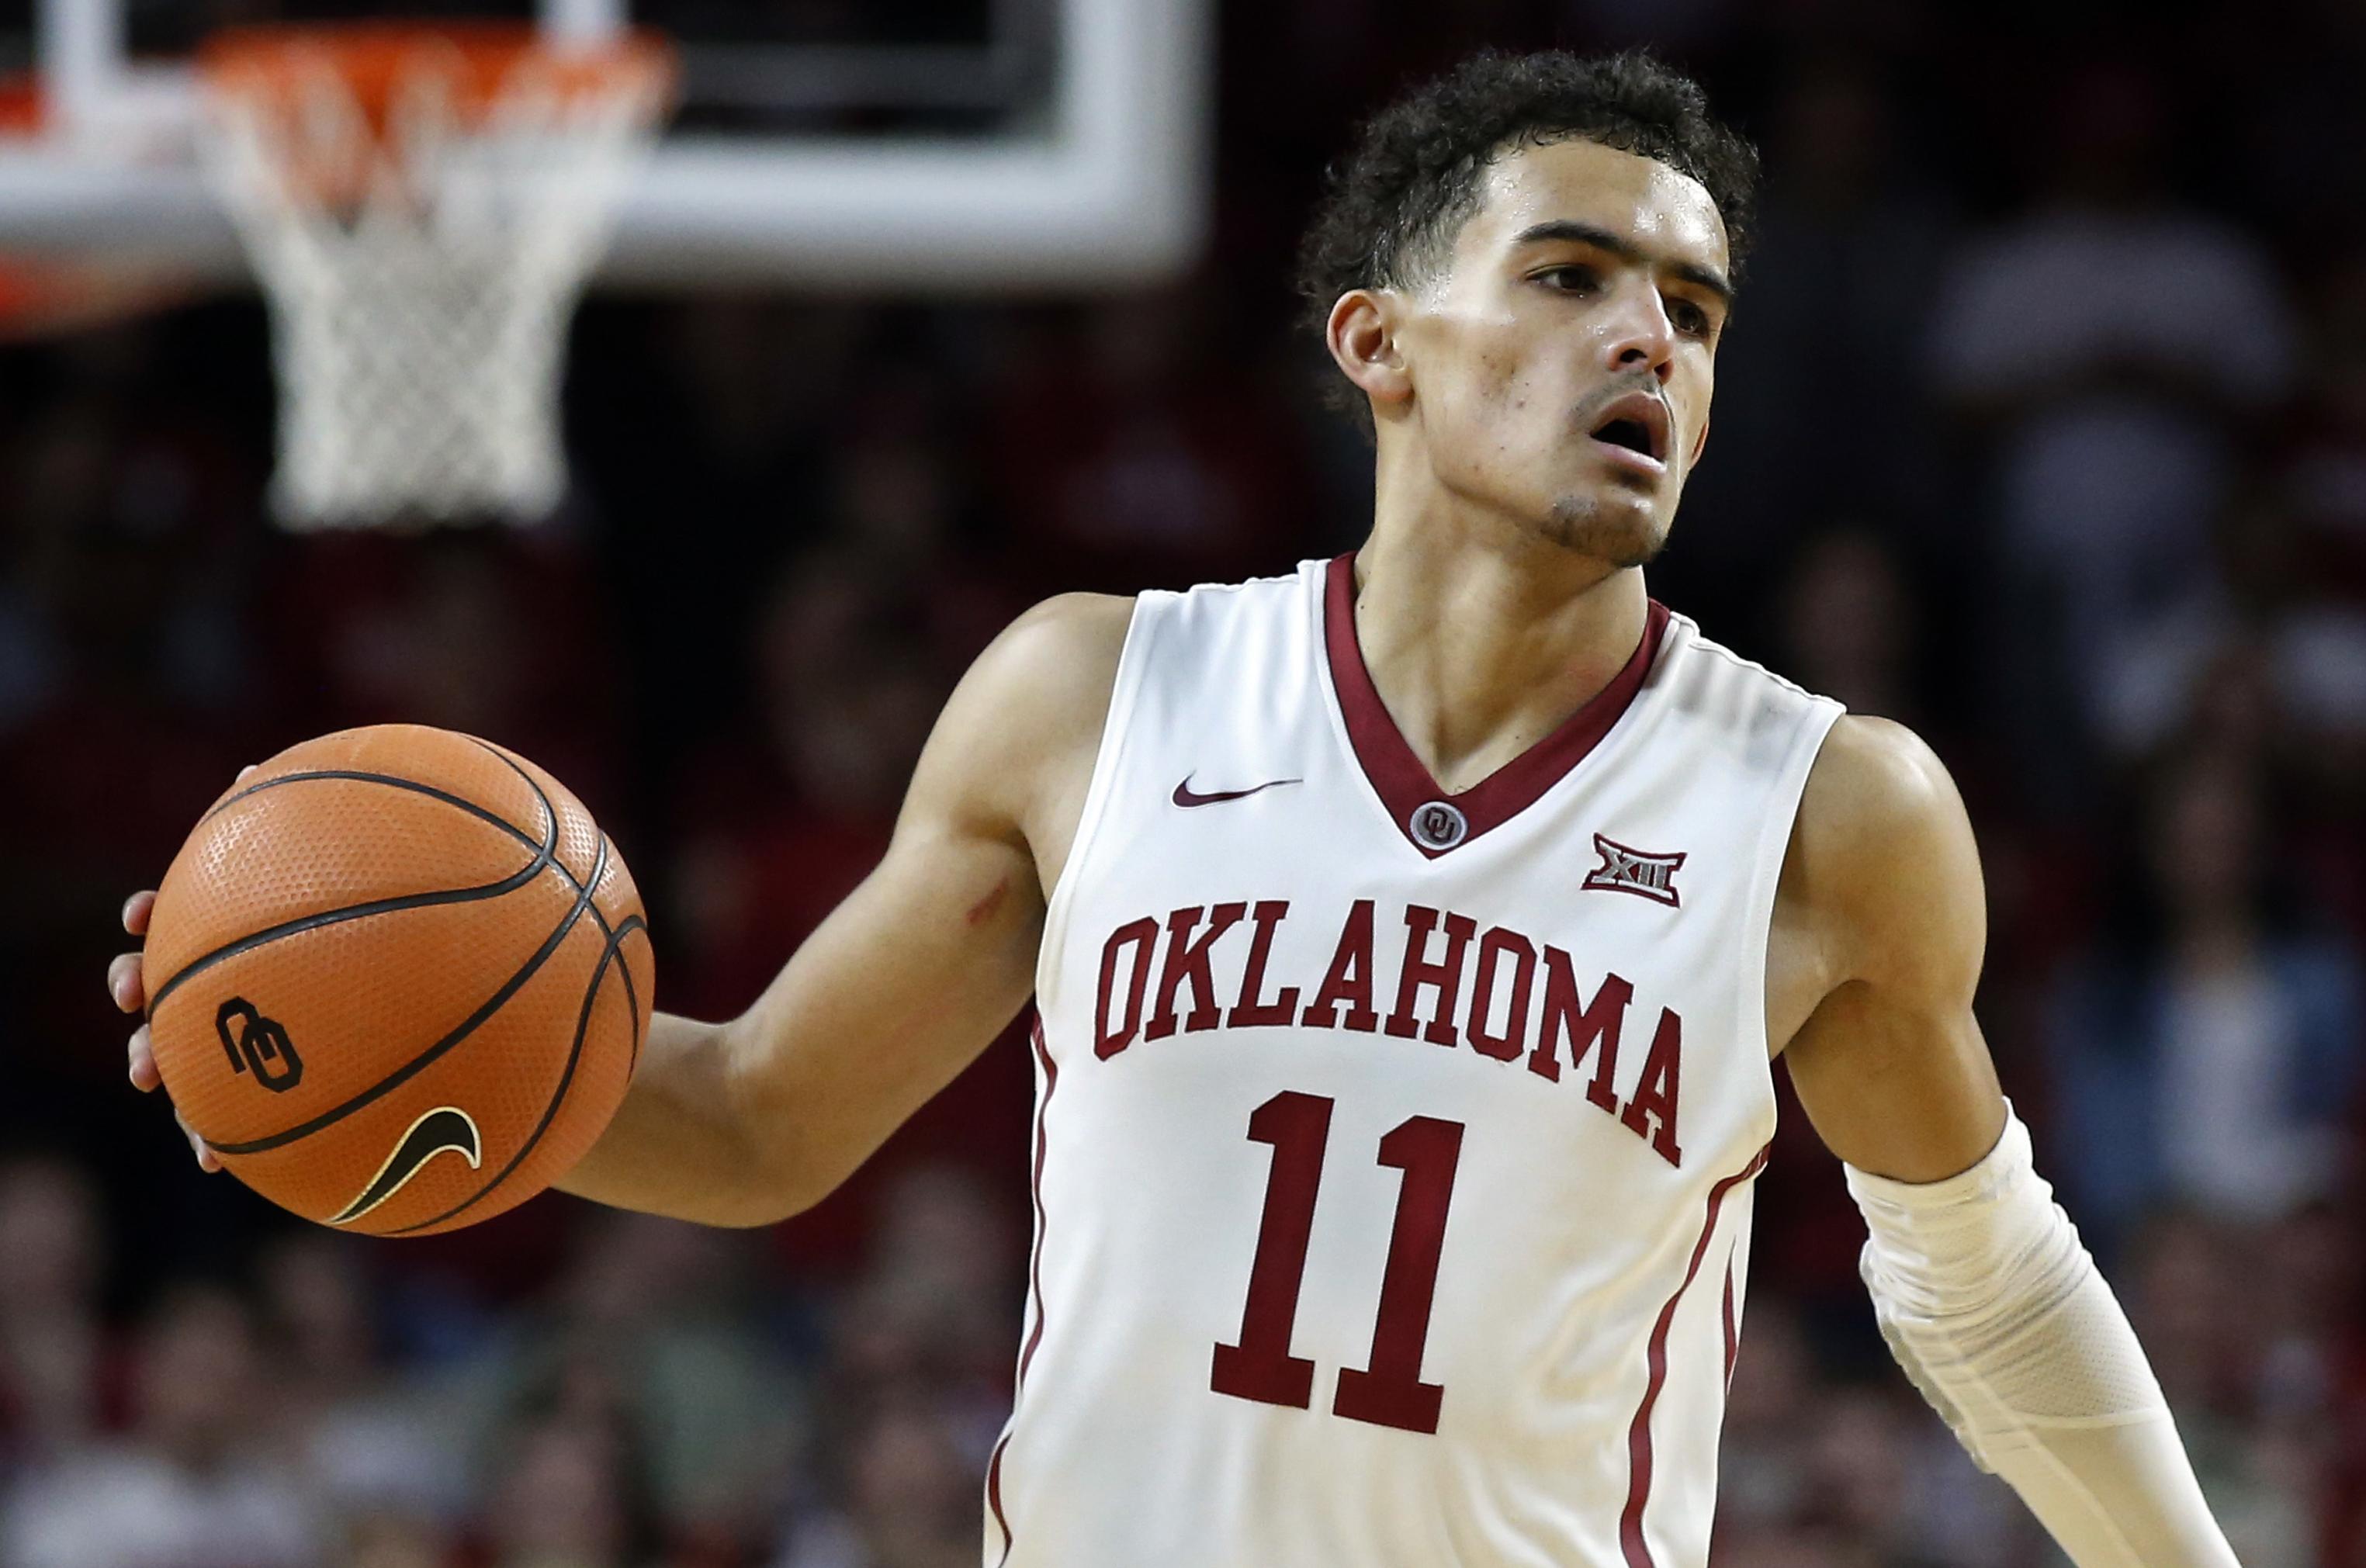 43f6ab6bba88 Oklahoma s Trae Young leaving for NBA after freshman season